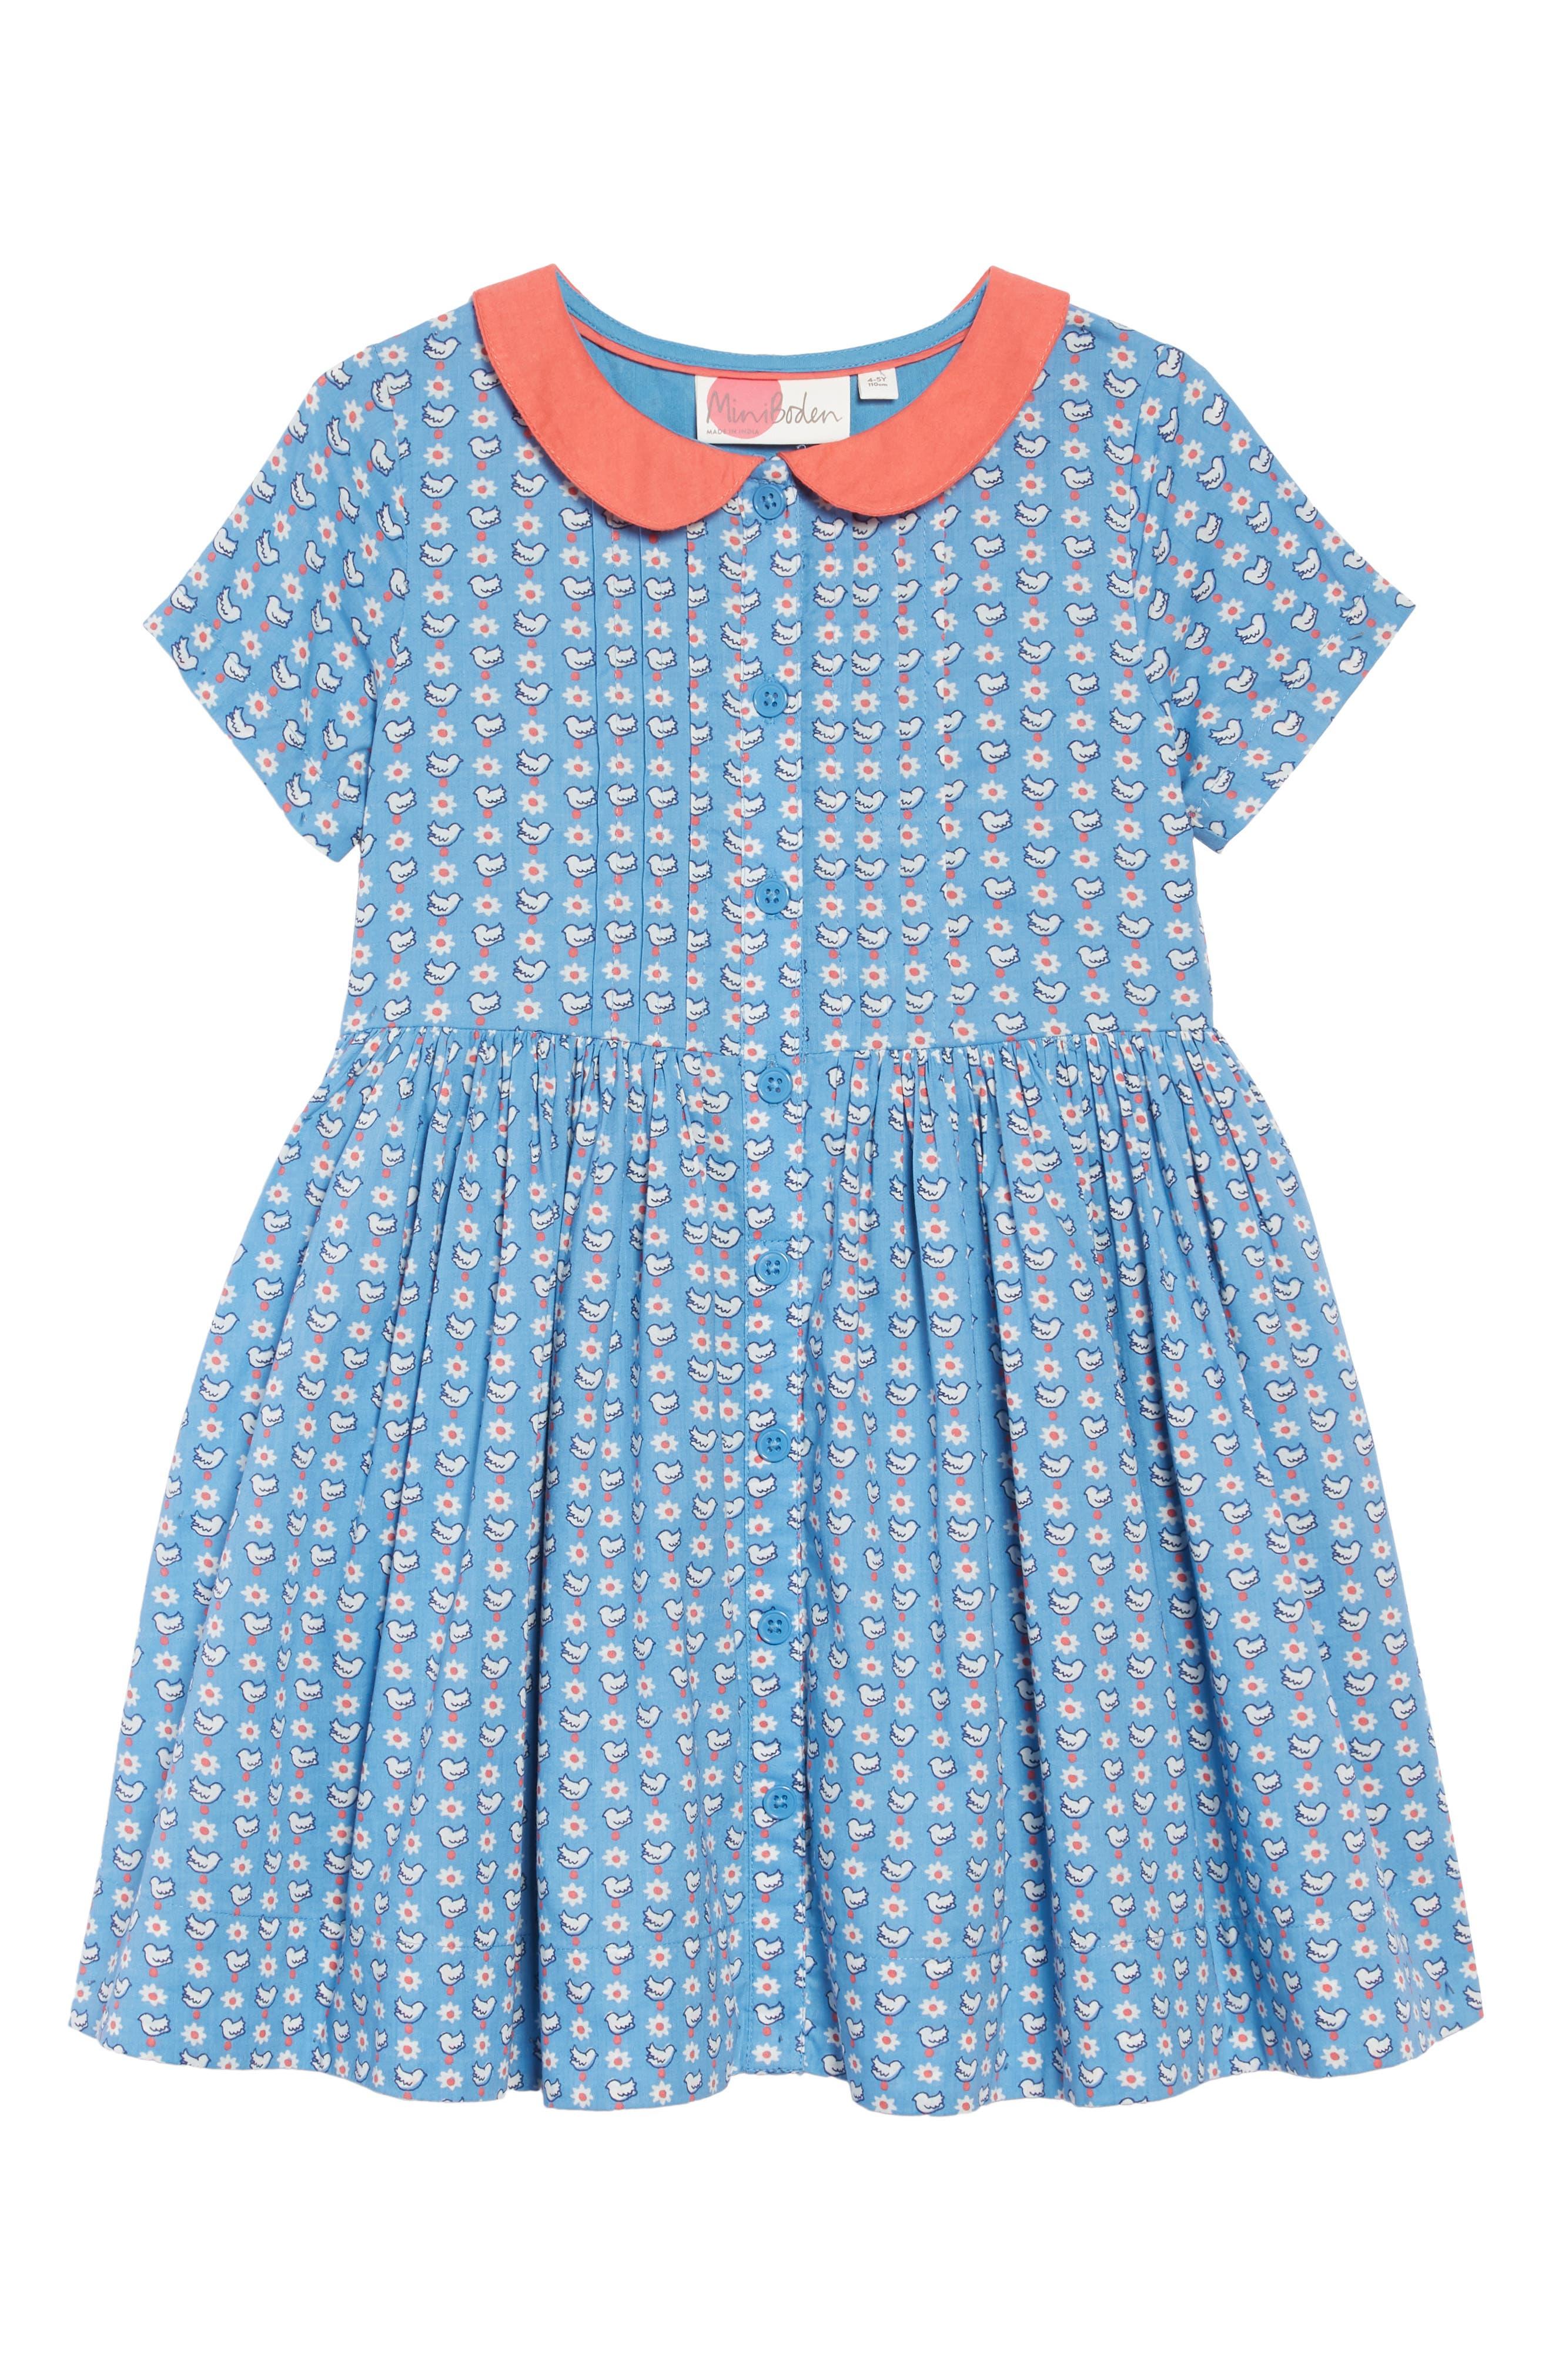 Nostalgic Collared Dress,                         Main,                         color, 454